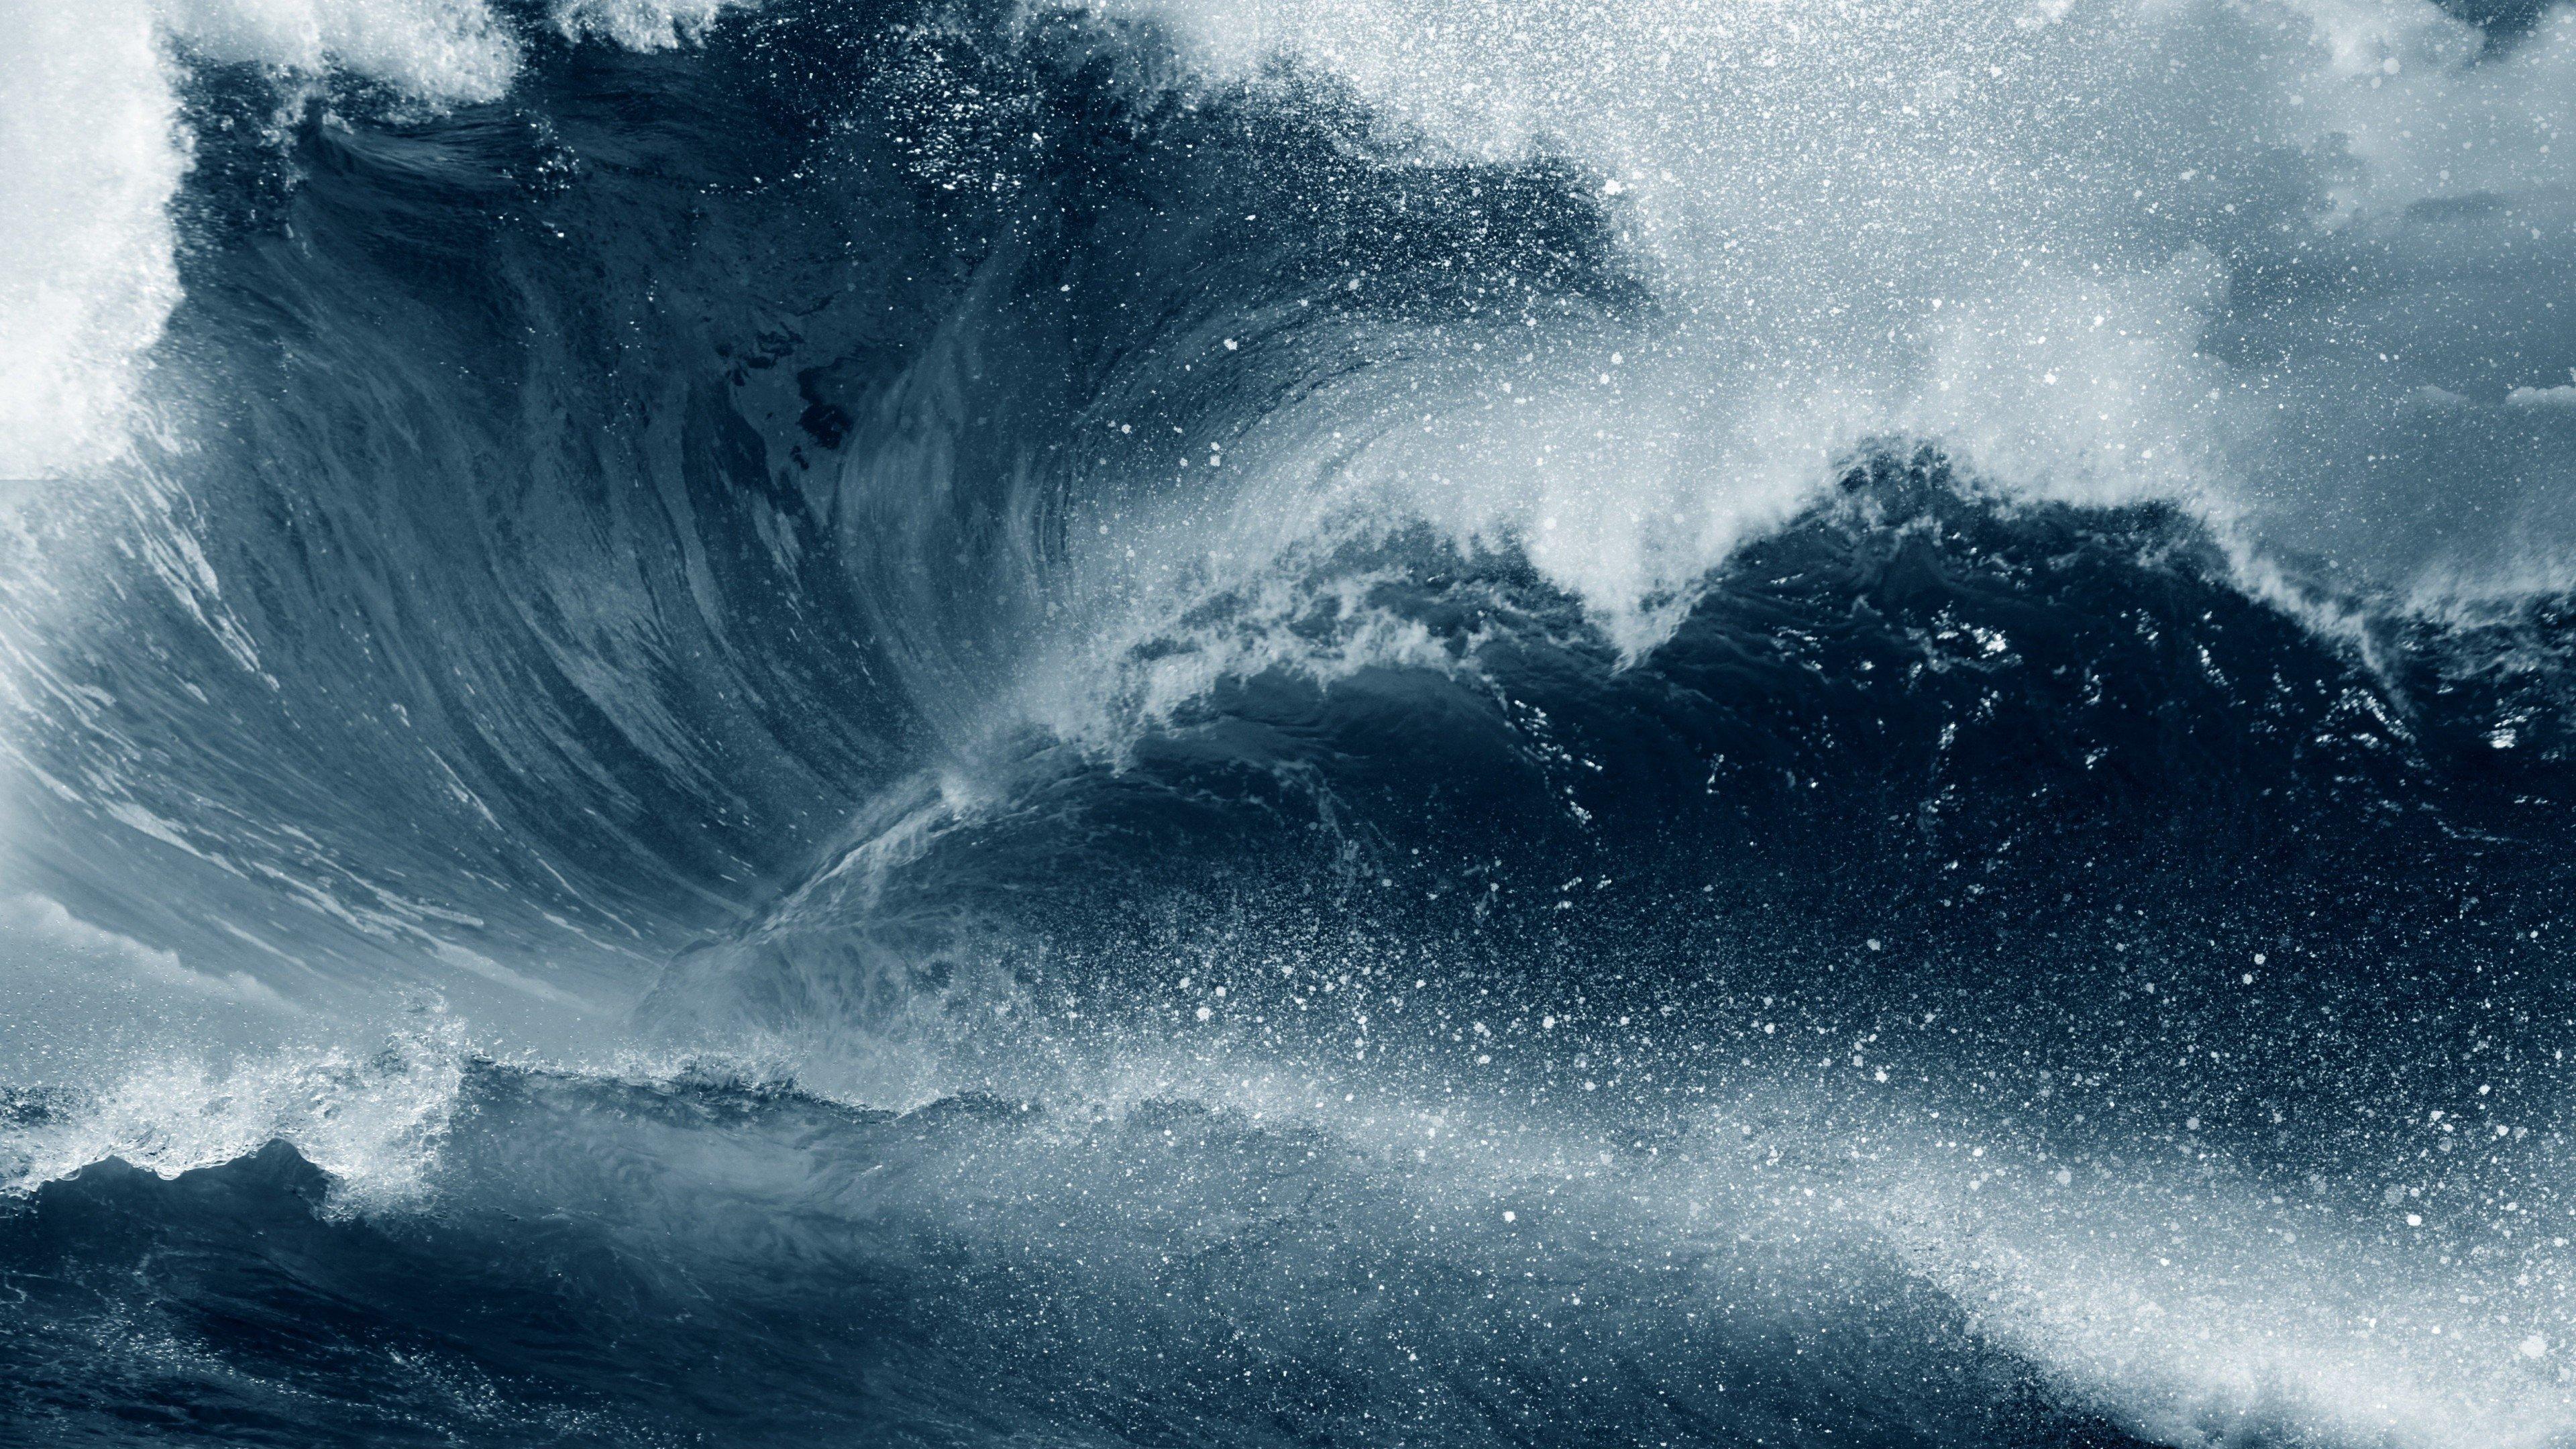 Wallpaper Wave in the ocean during storm